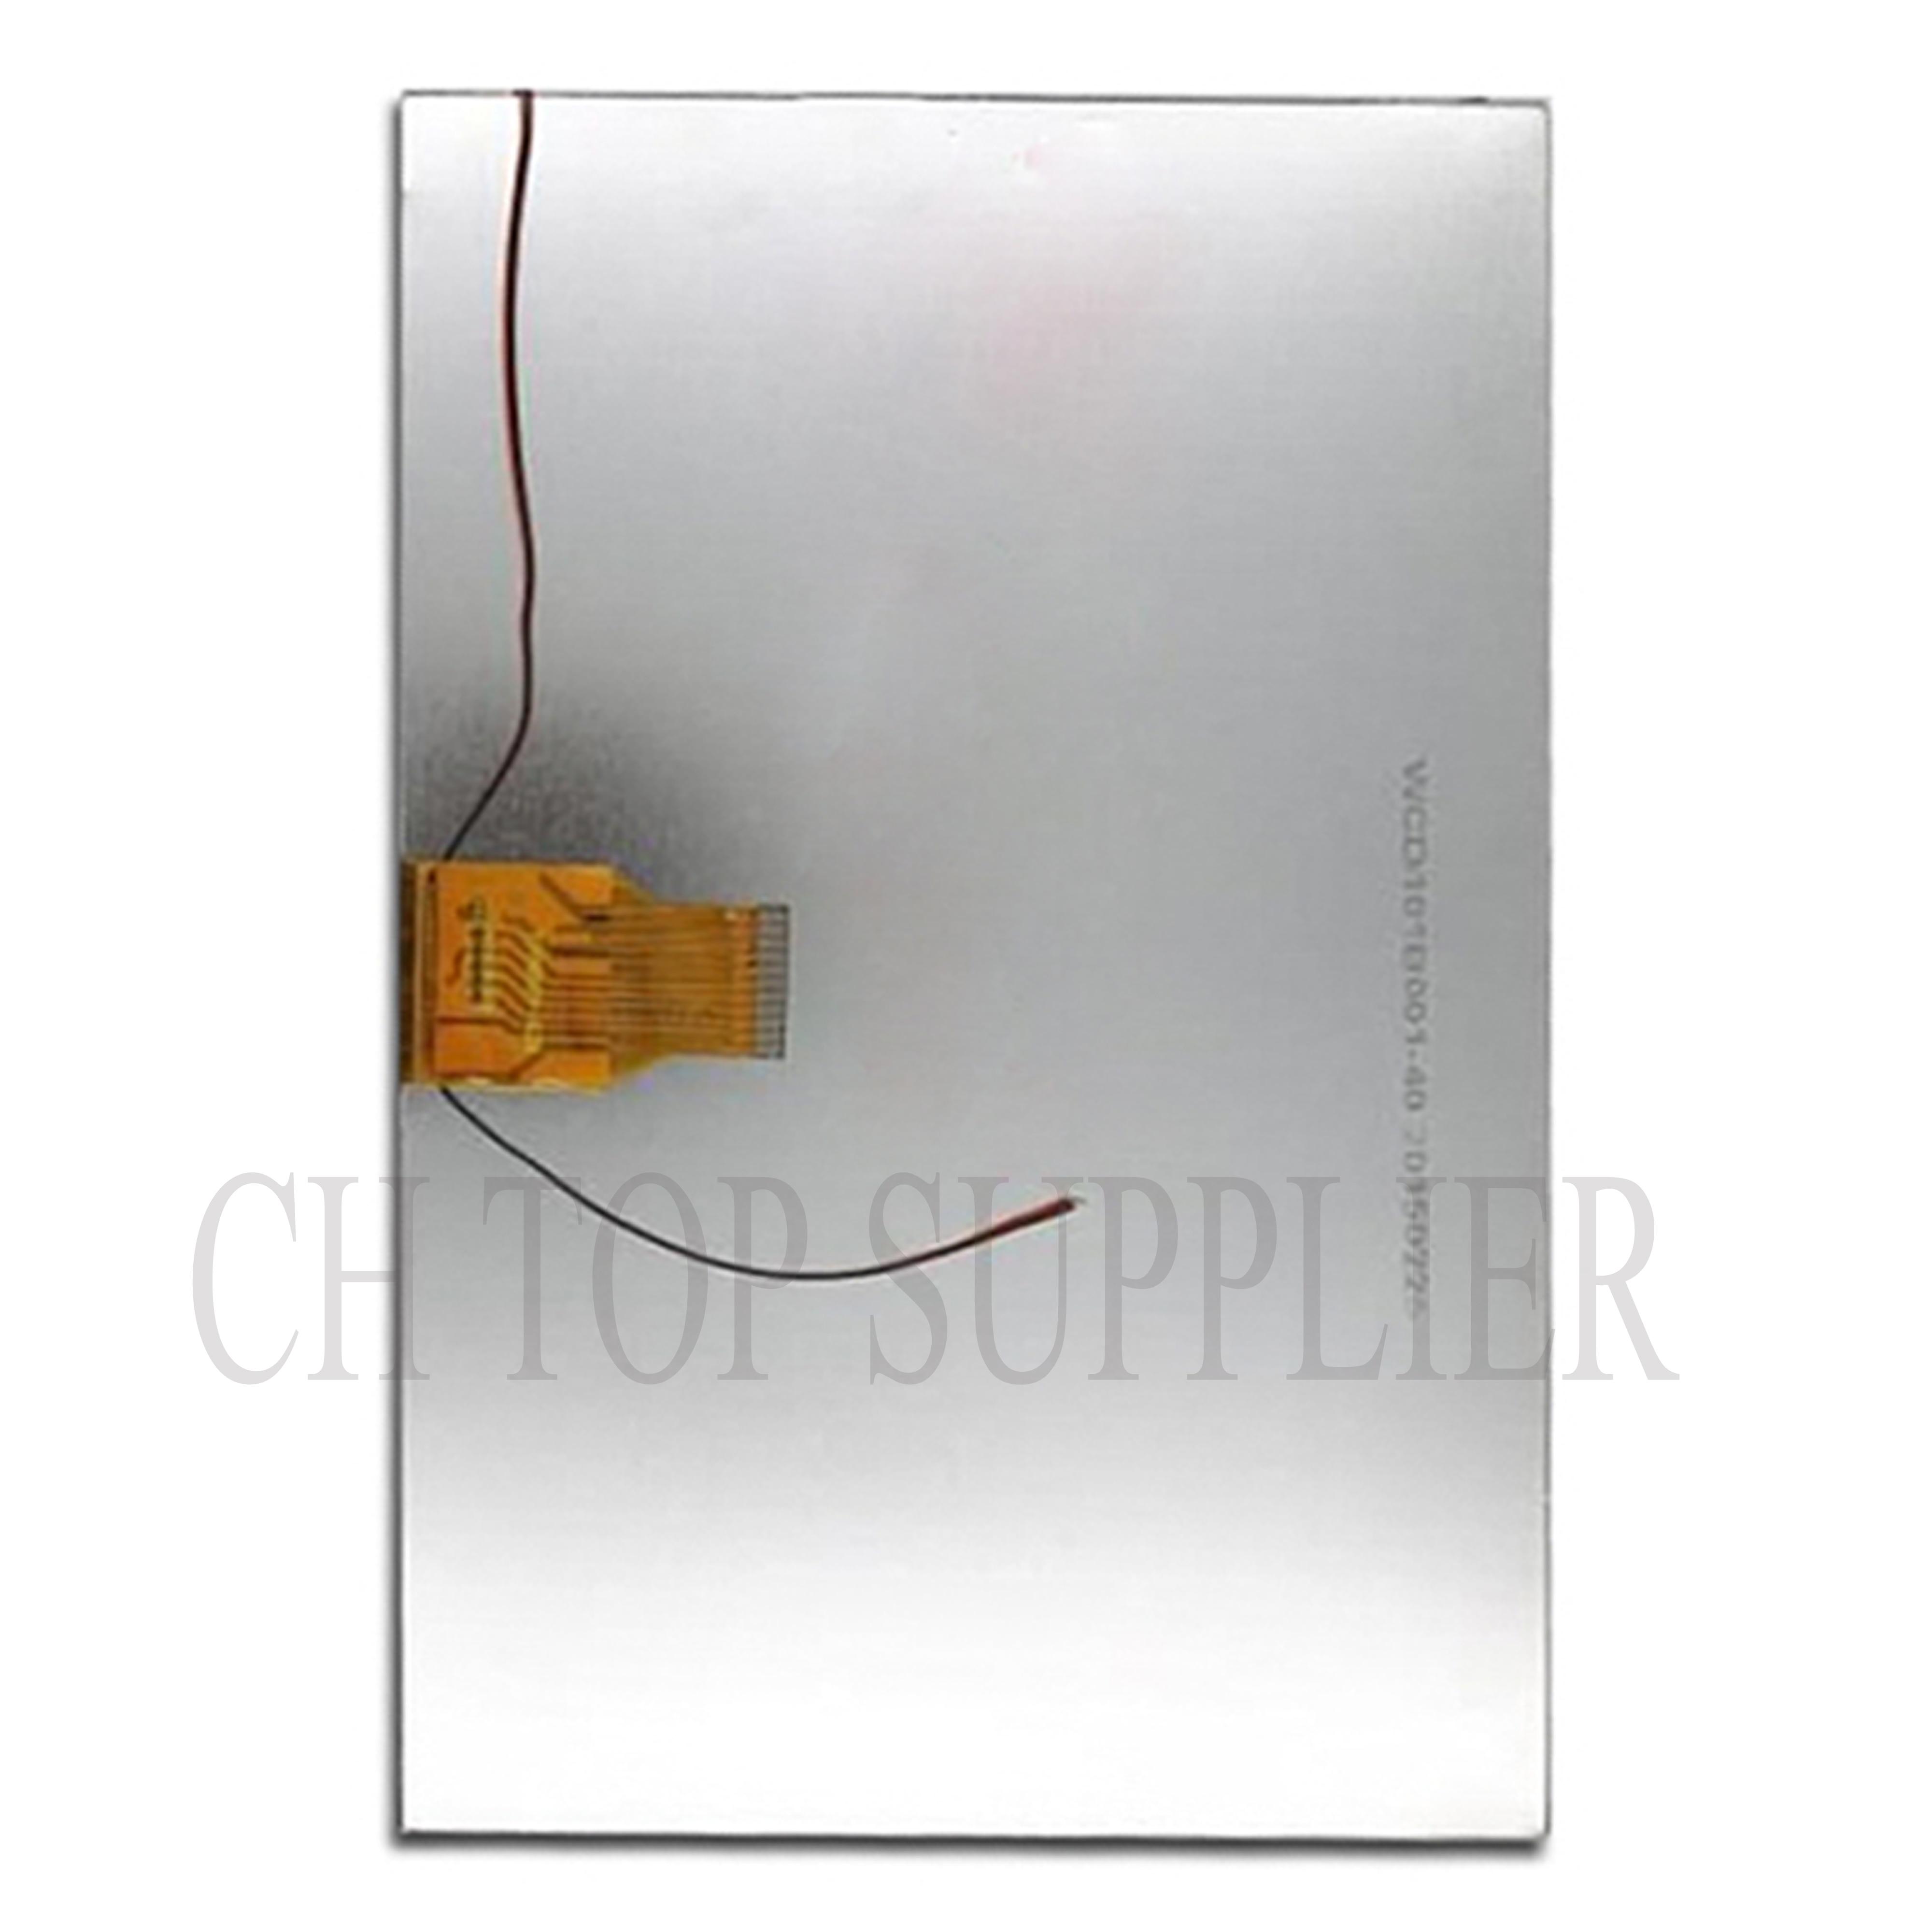 New LCD Display Matrix 10.1 inch BQ-1050G BQ 1050G Tablet 1024*600 TFT LCD Screen Replacement Panel Parts Free Shipping 8inch lcd display matrix for irbis tz81l tablet tft lcd screen panel lens replacement free shipping